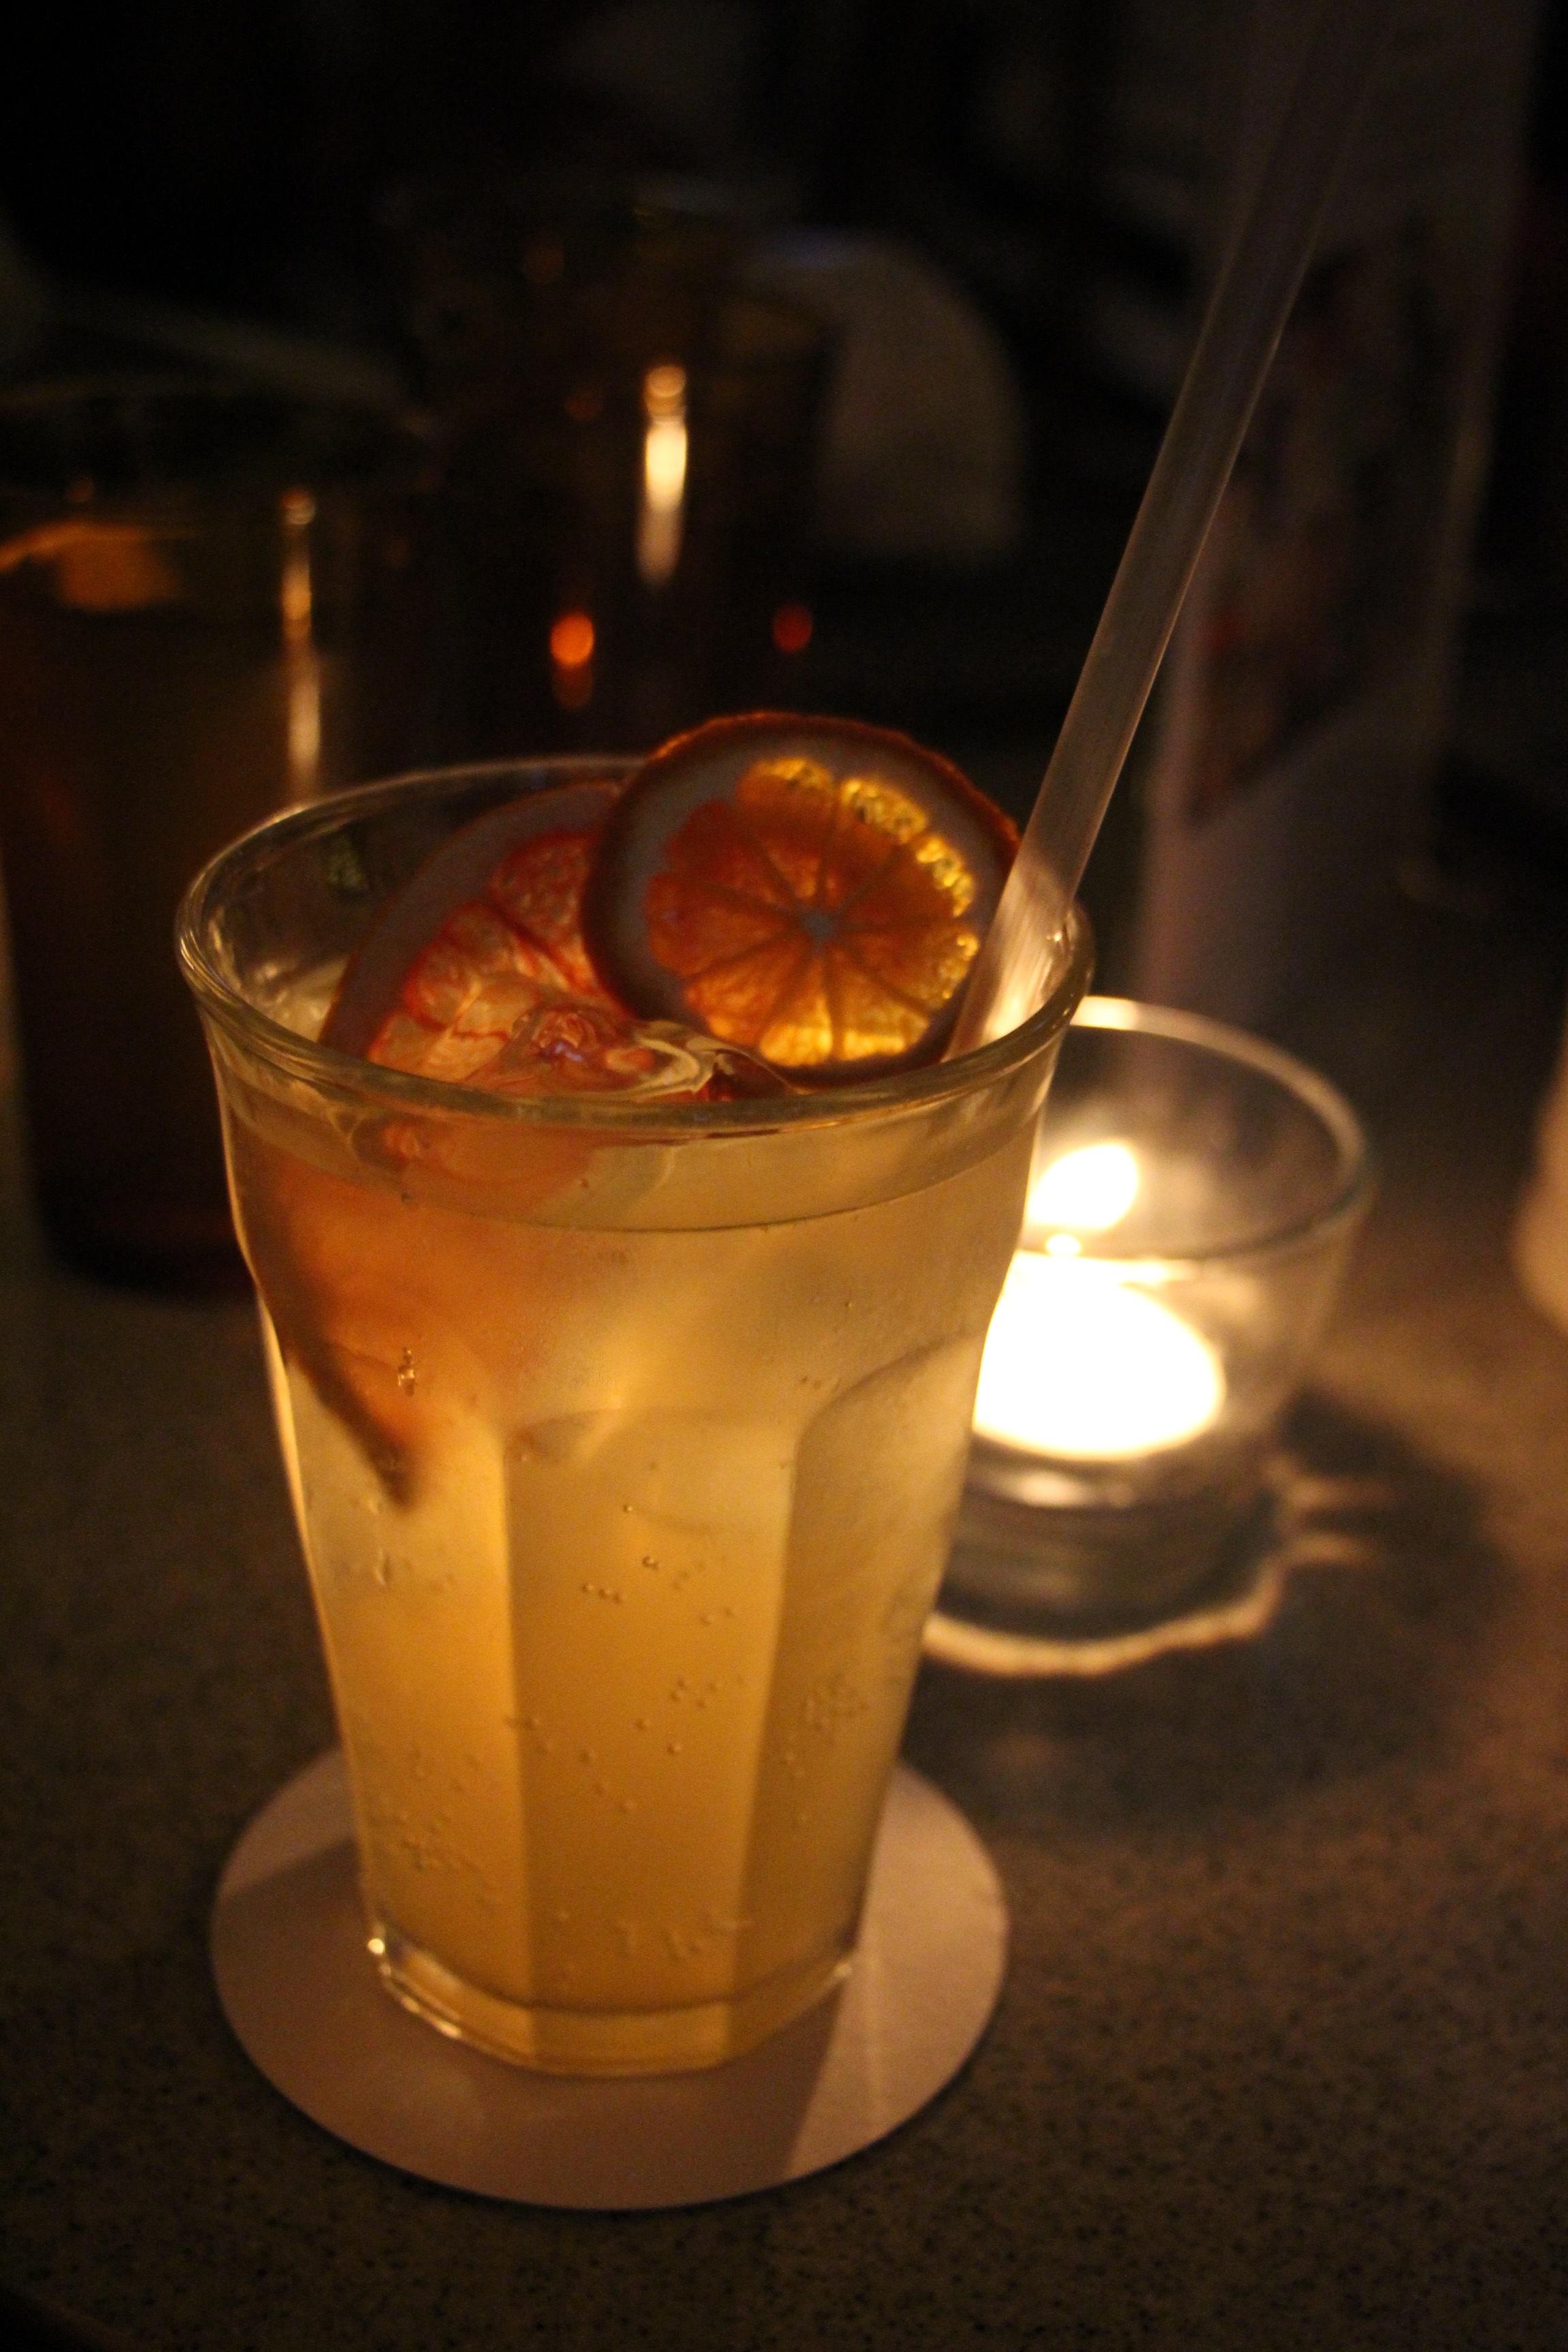 My Sherbie Hancock - Zingy sherbet lemonade with orange, lemon and grapefruit.